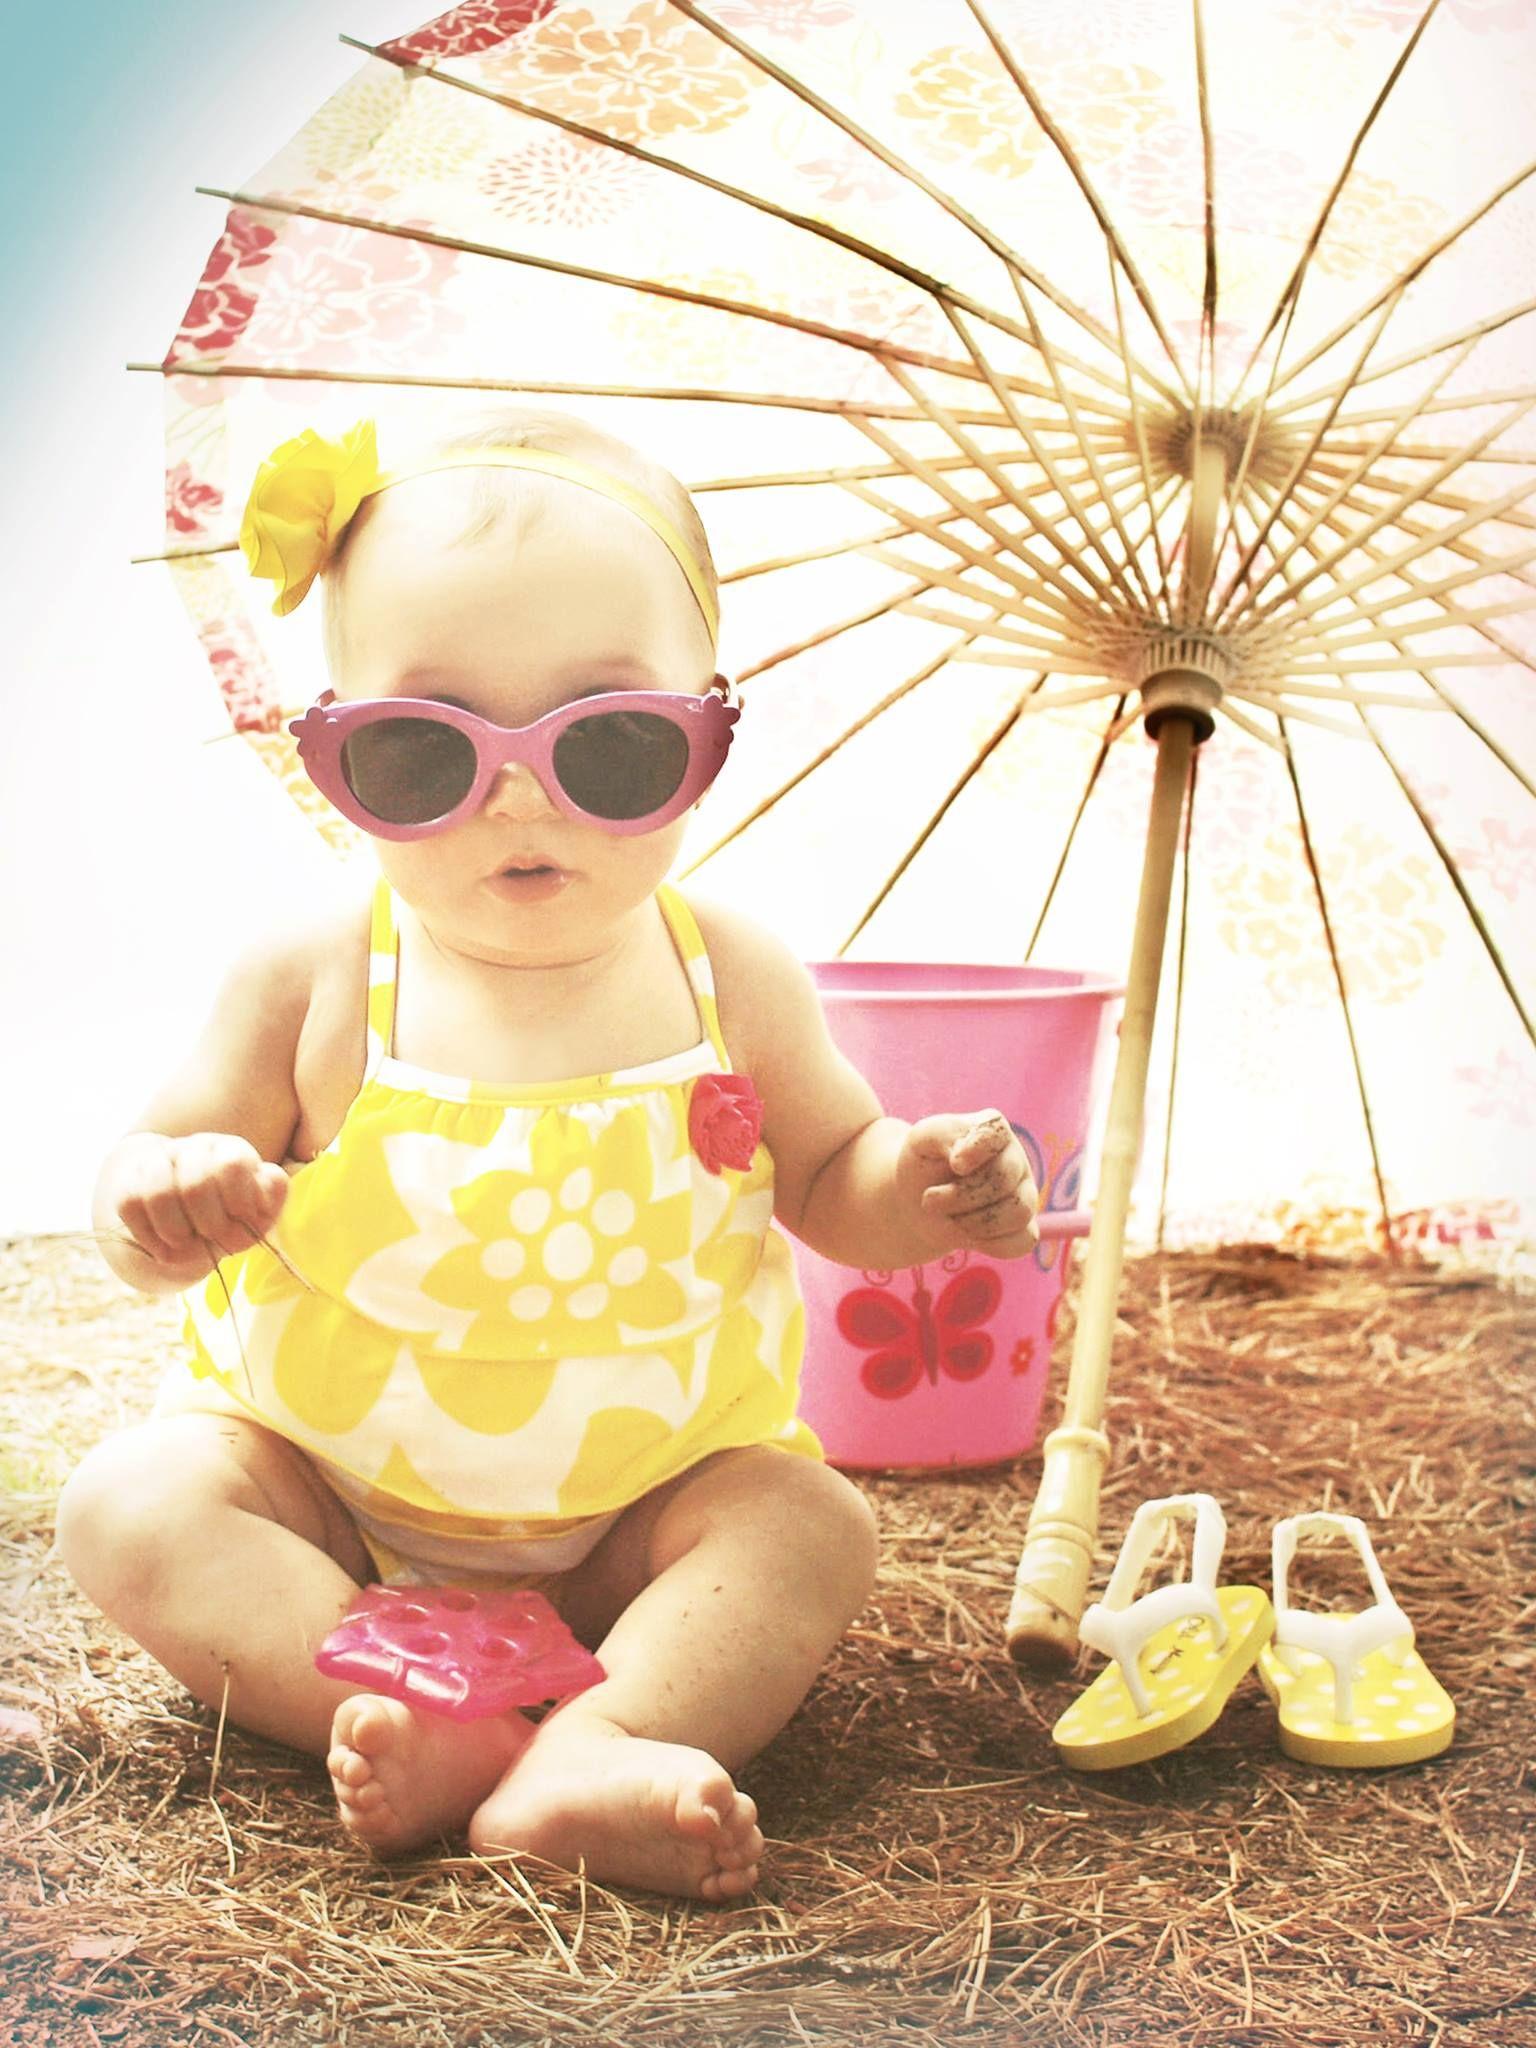 Baby girl summer beach photography Pretty creative vacation